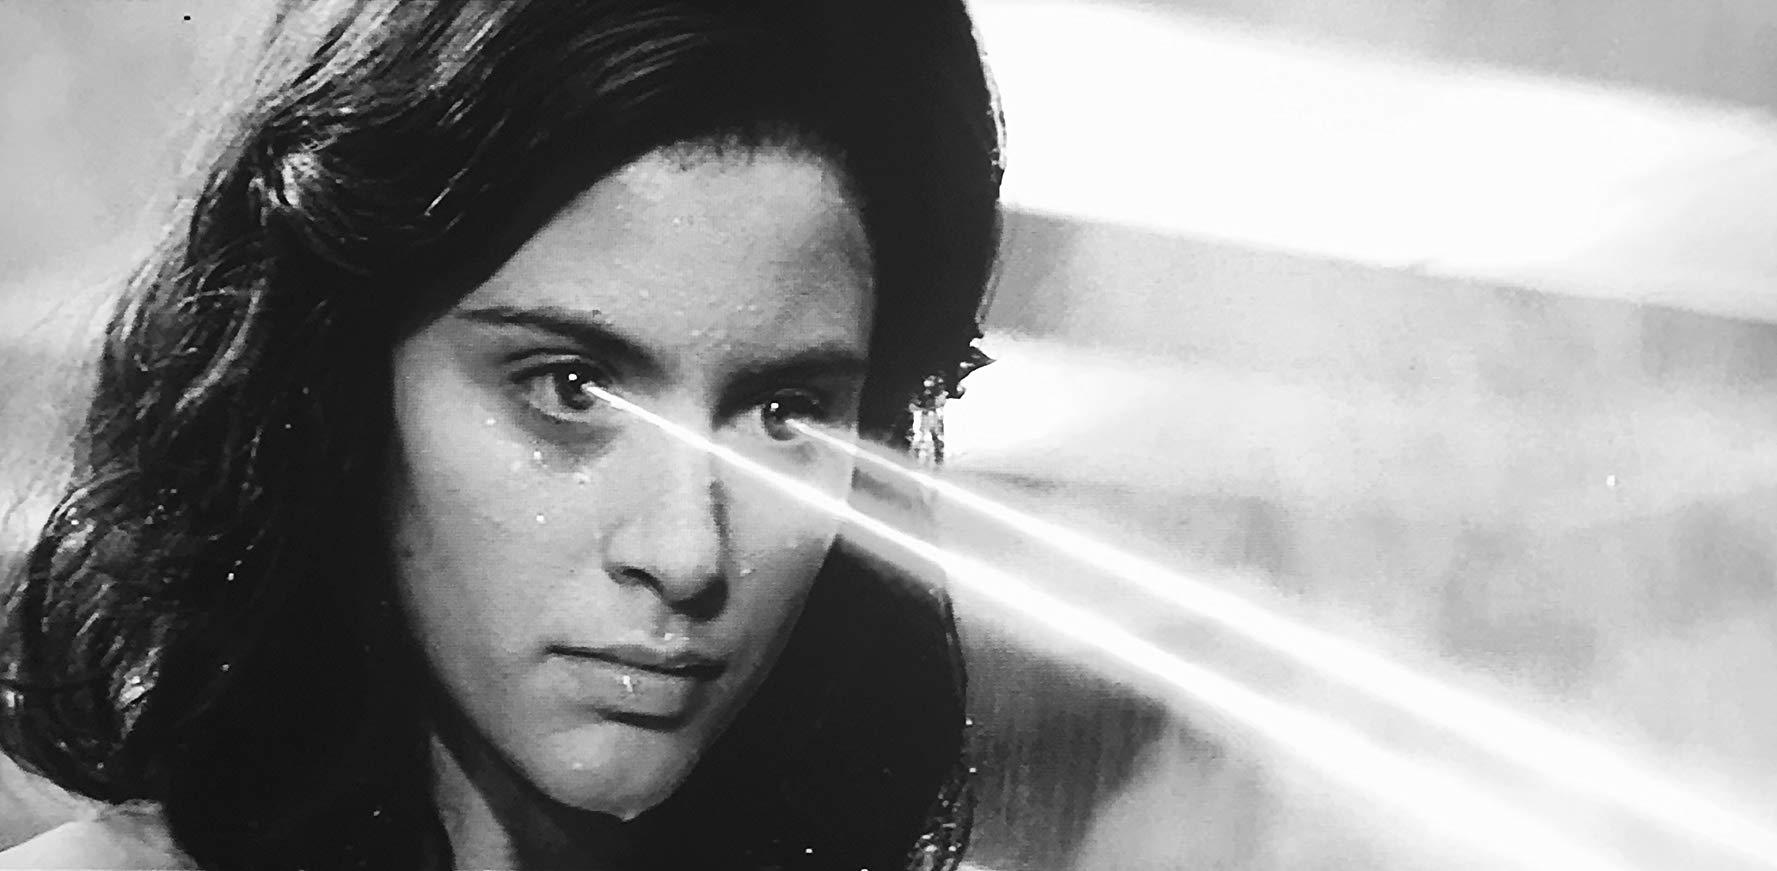 Супергёрл (Supergirl) 1984